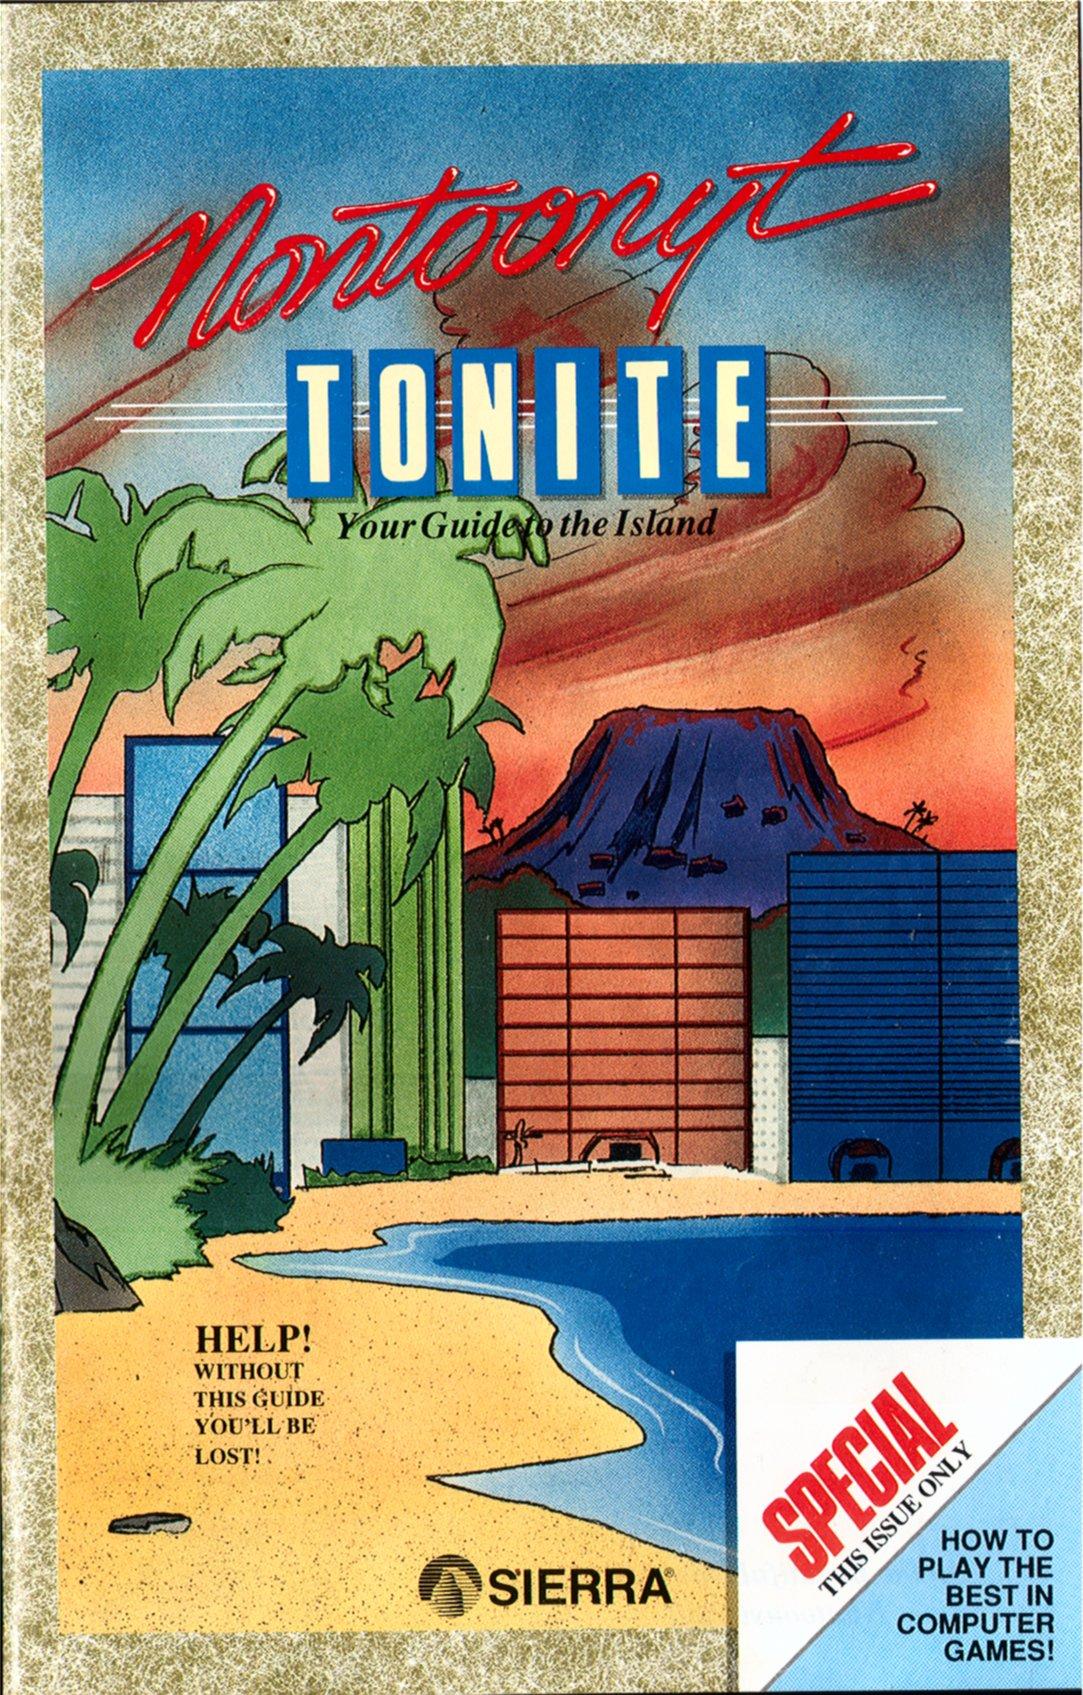 Nontoonyt Tonite!